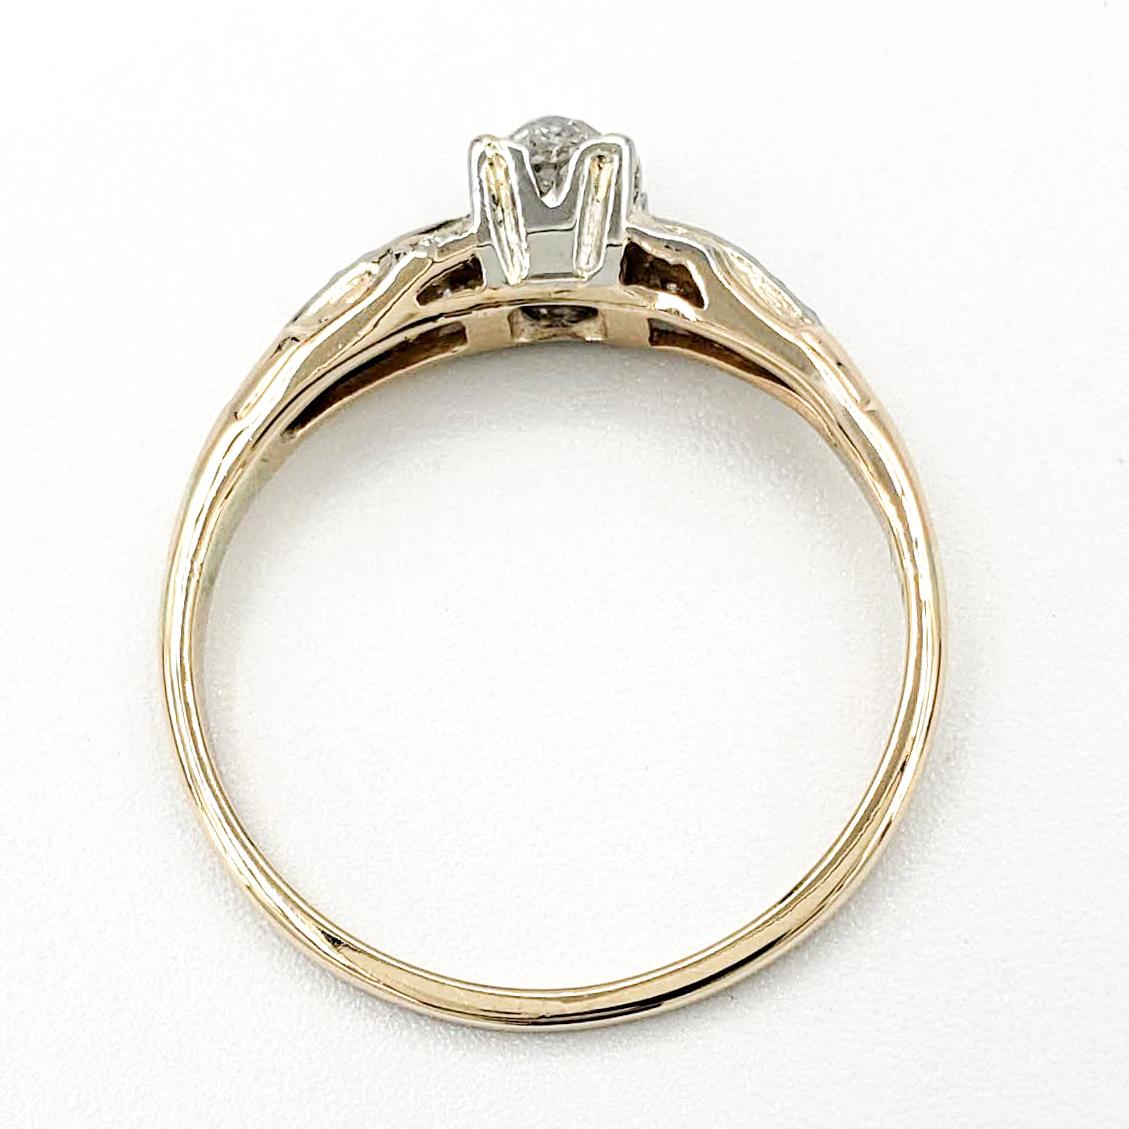 vintage-14-karat-gold-engagement-ring-with-0-40-carat-old-mine-cut-diamond-egl-g-si1